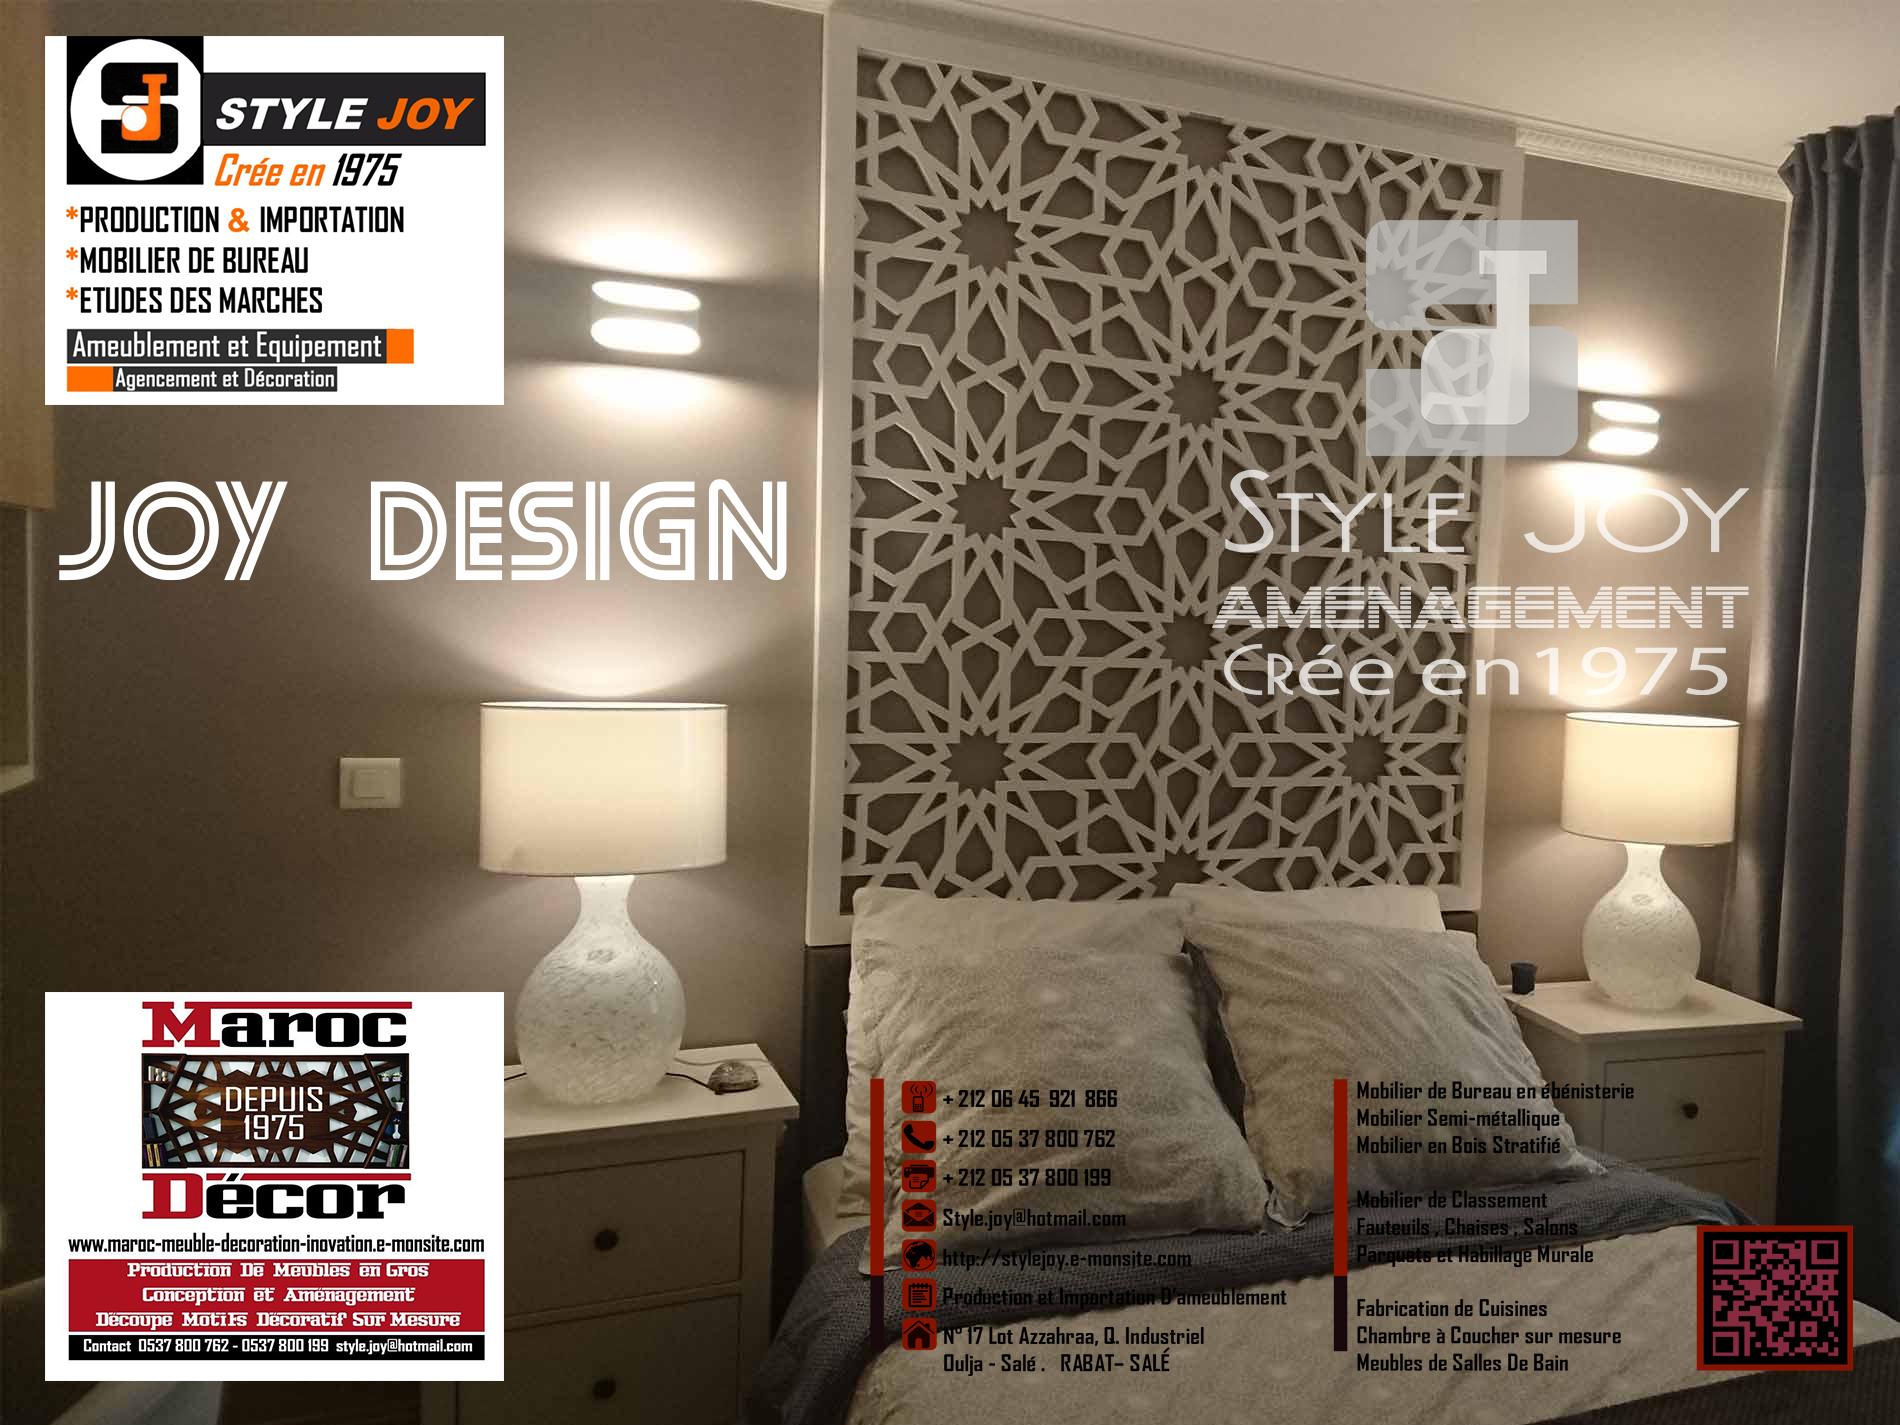 Chambre à coucher occasion maroc cilek maroc chambres enfants